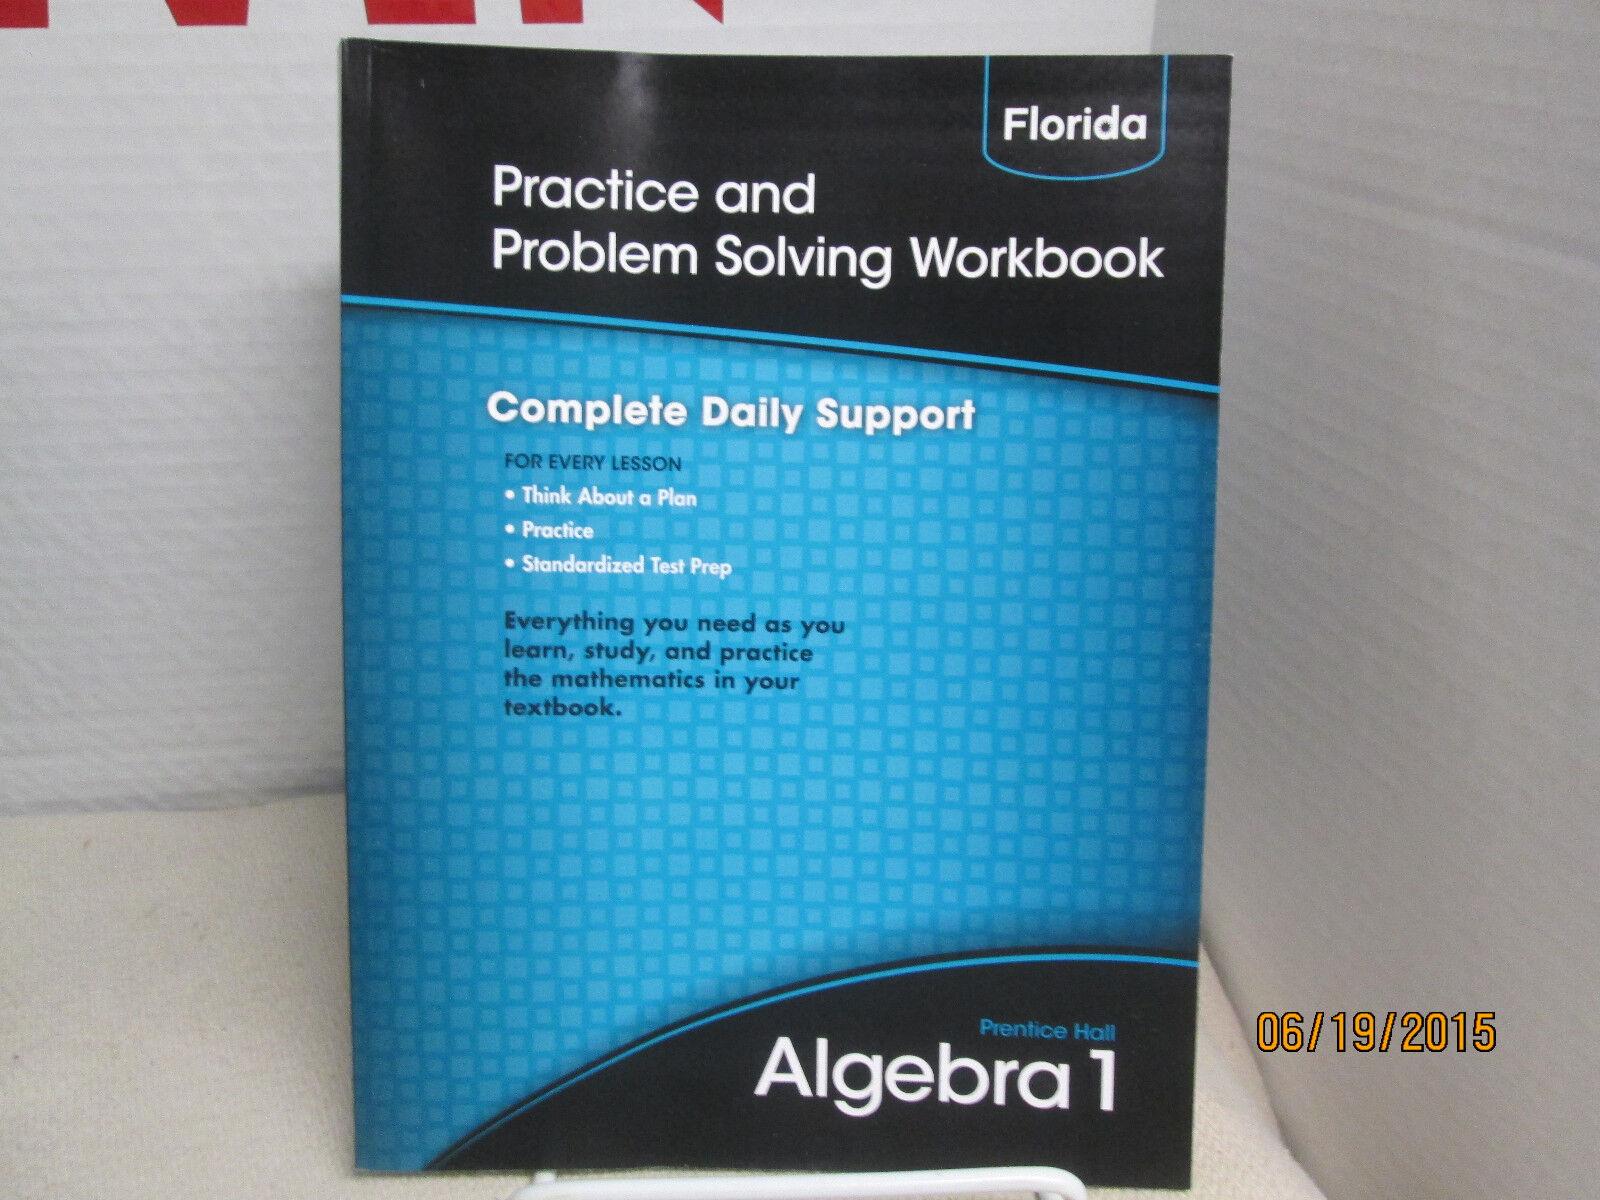 prentice hall algebra 1 practice and problem solving workbook answer key